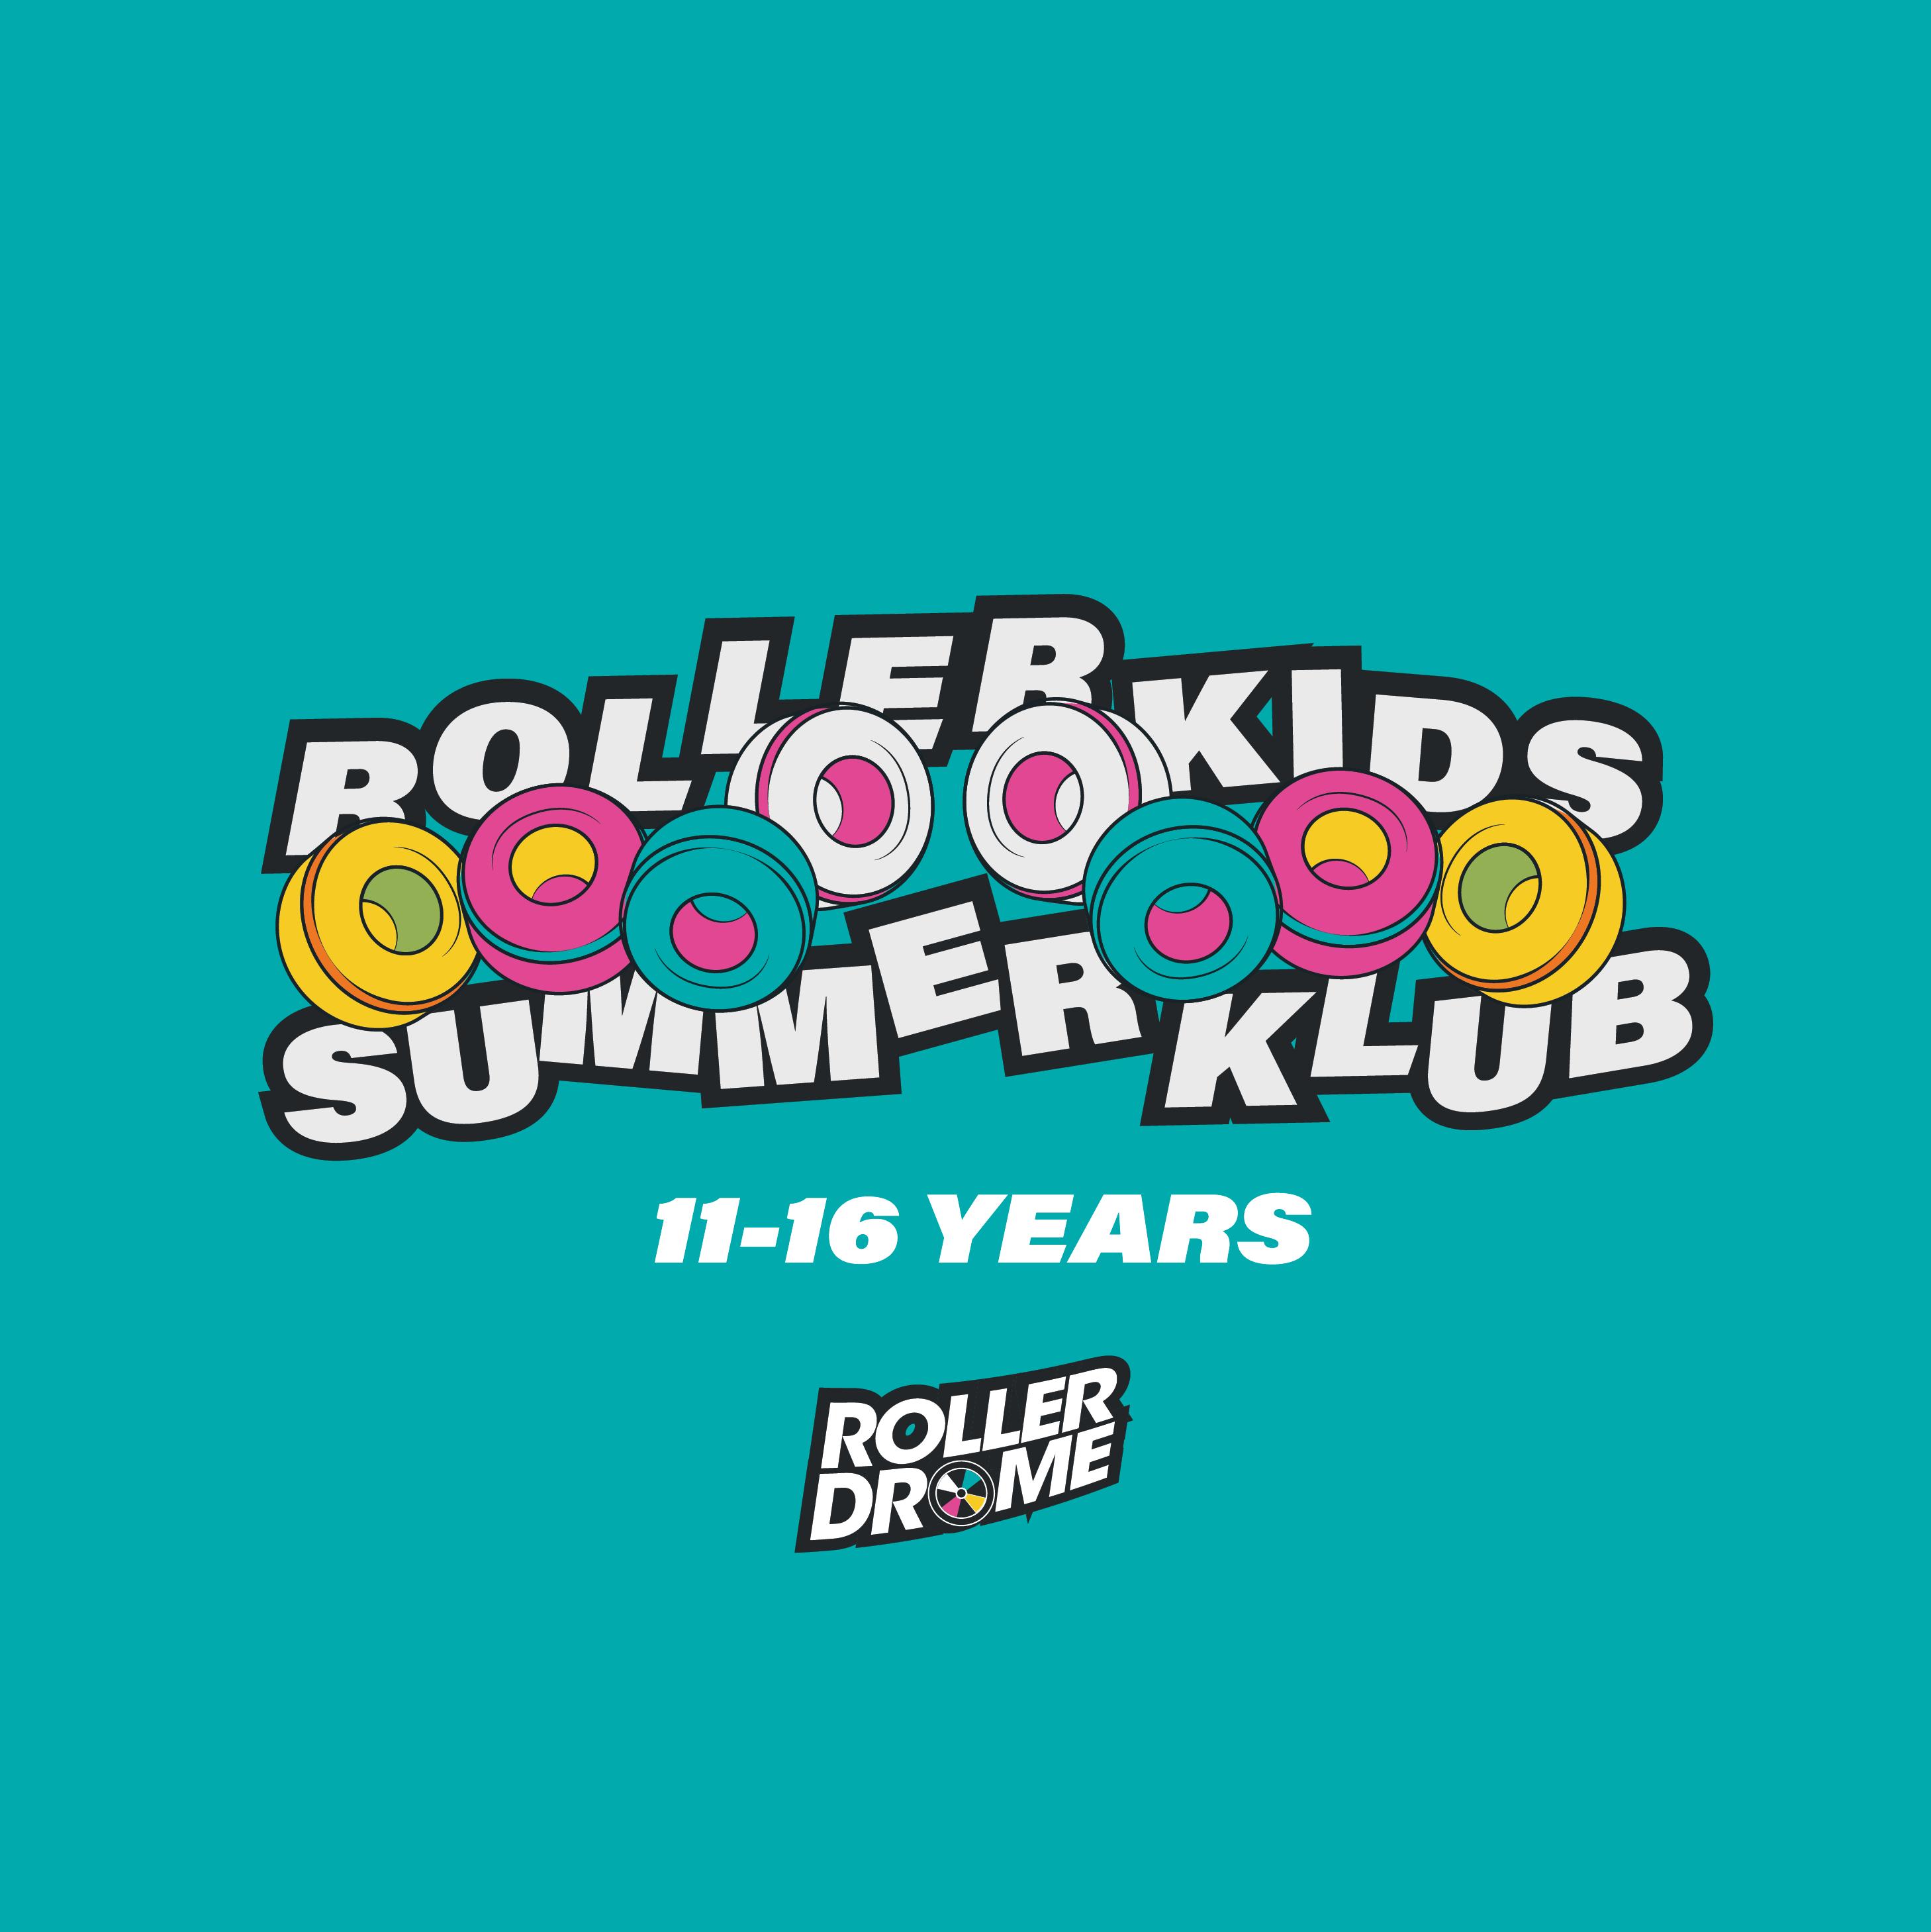 Rollerkids Summer Klub 11-16 years